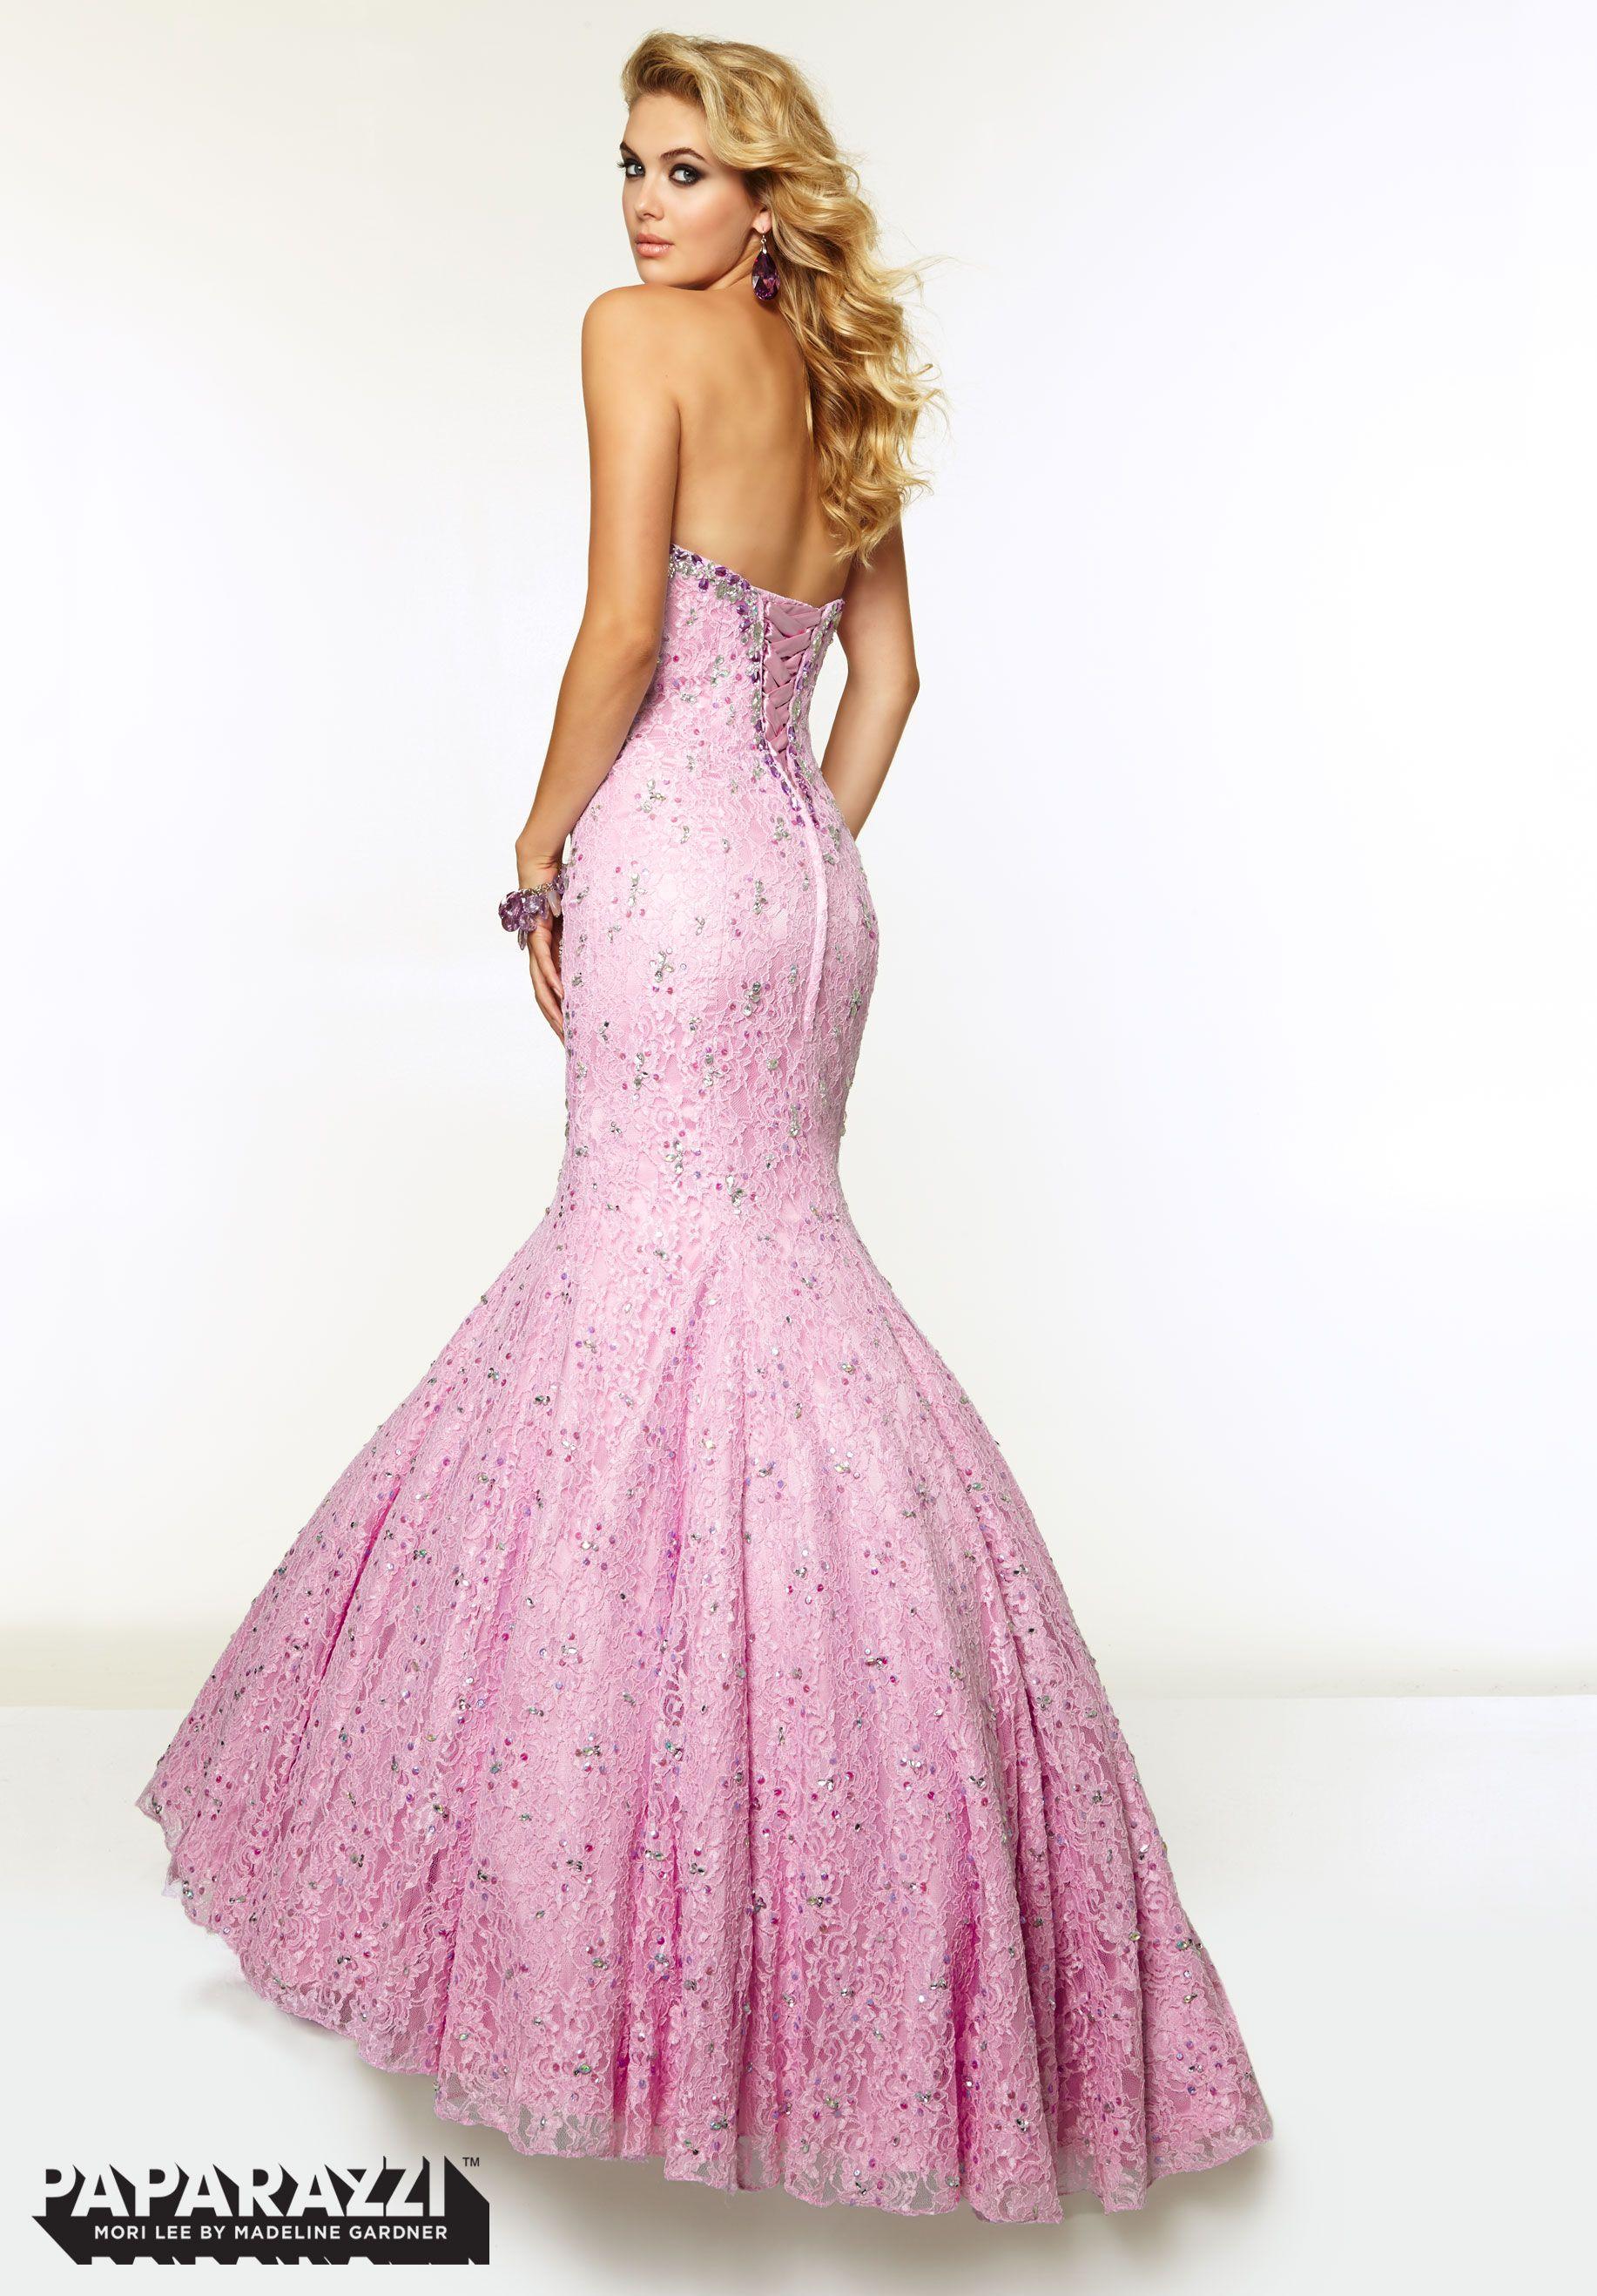 Prom Dresses – Paparazzi Prom Dress Style 97082 | PROM | Pinterest